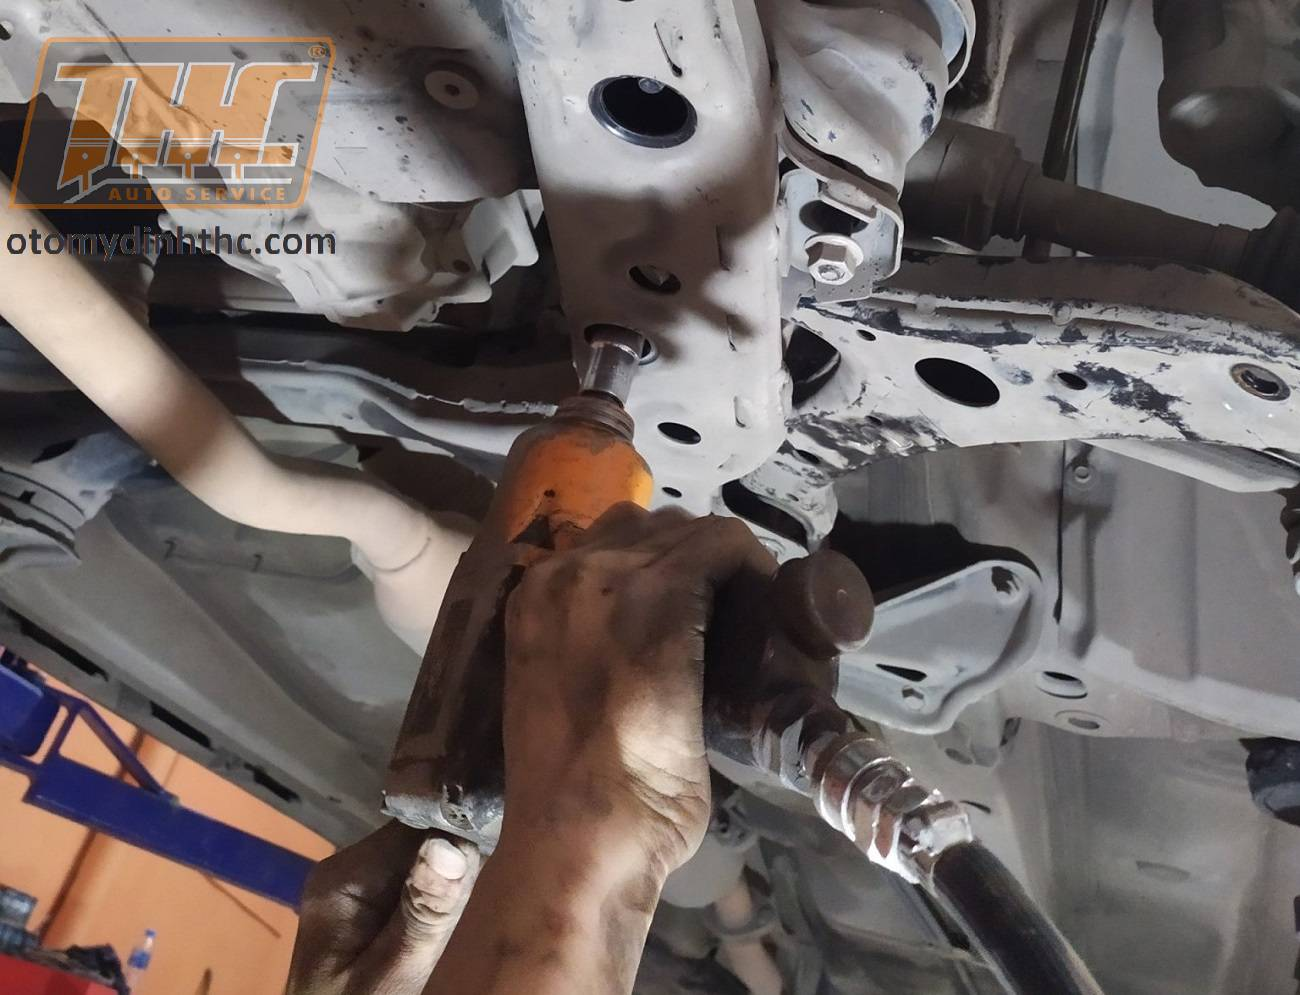 thay-cao-su-cang-A-xe-toyota-camry-9